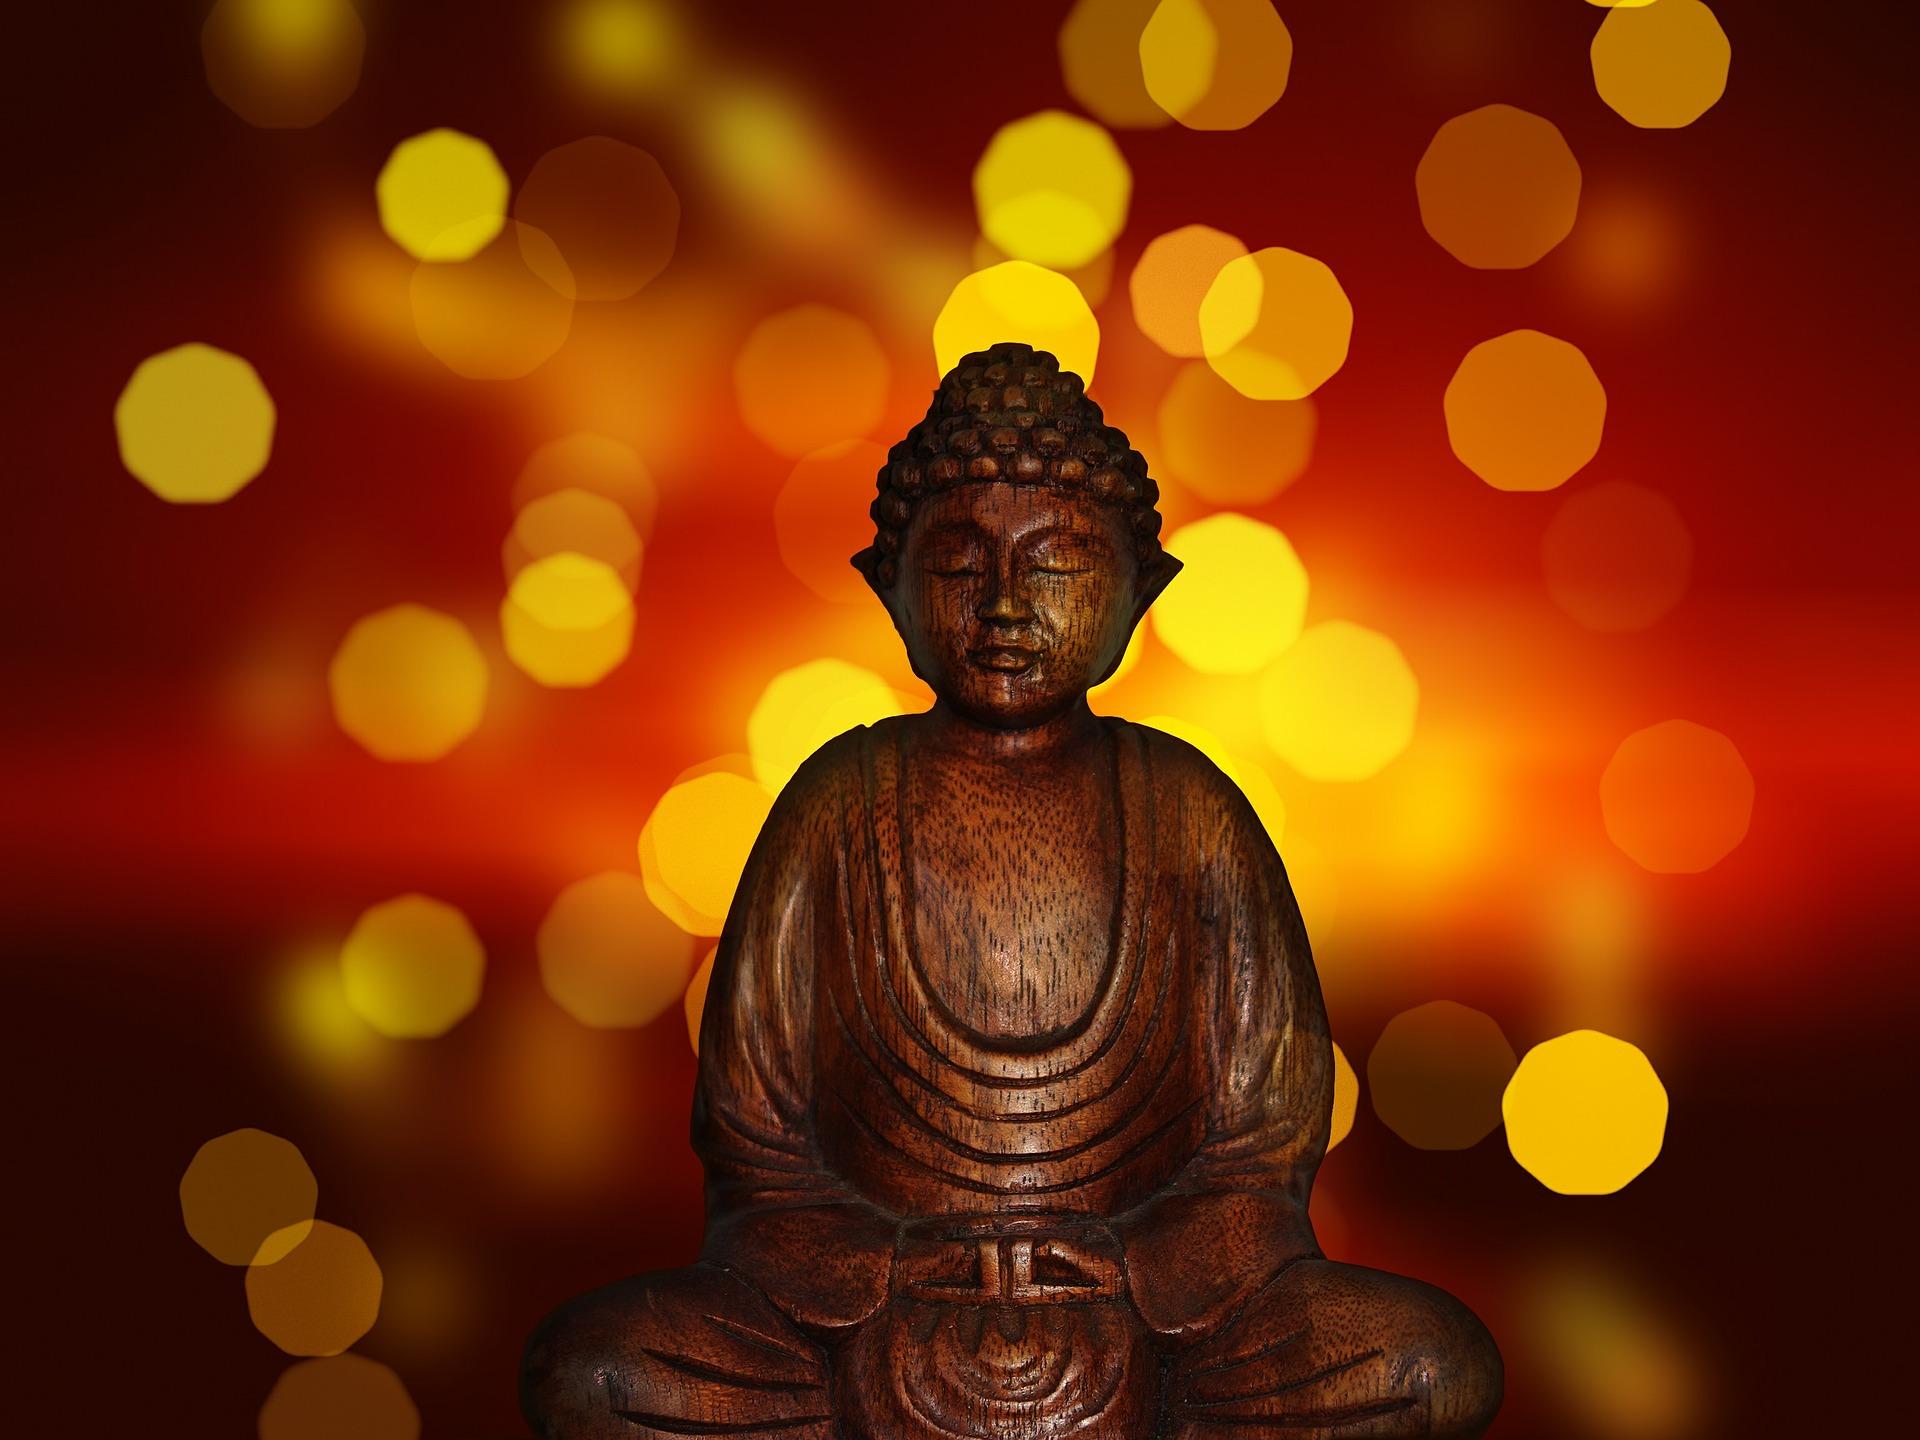 buddha-525883_1920.jpg